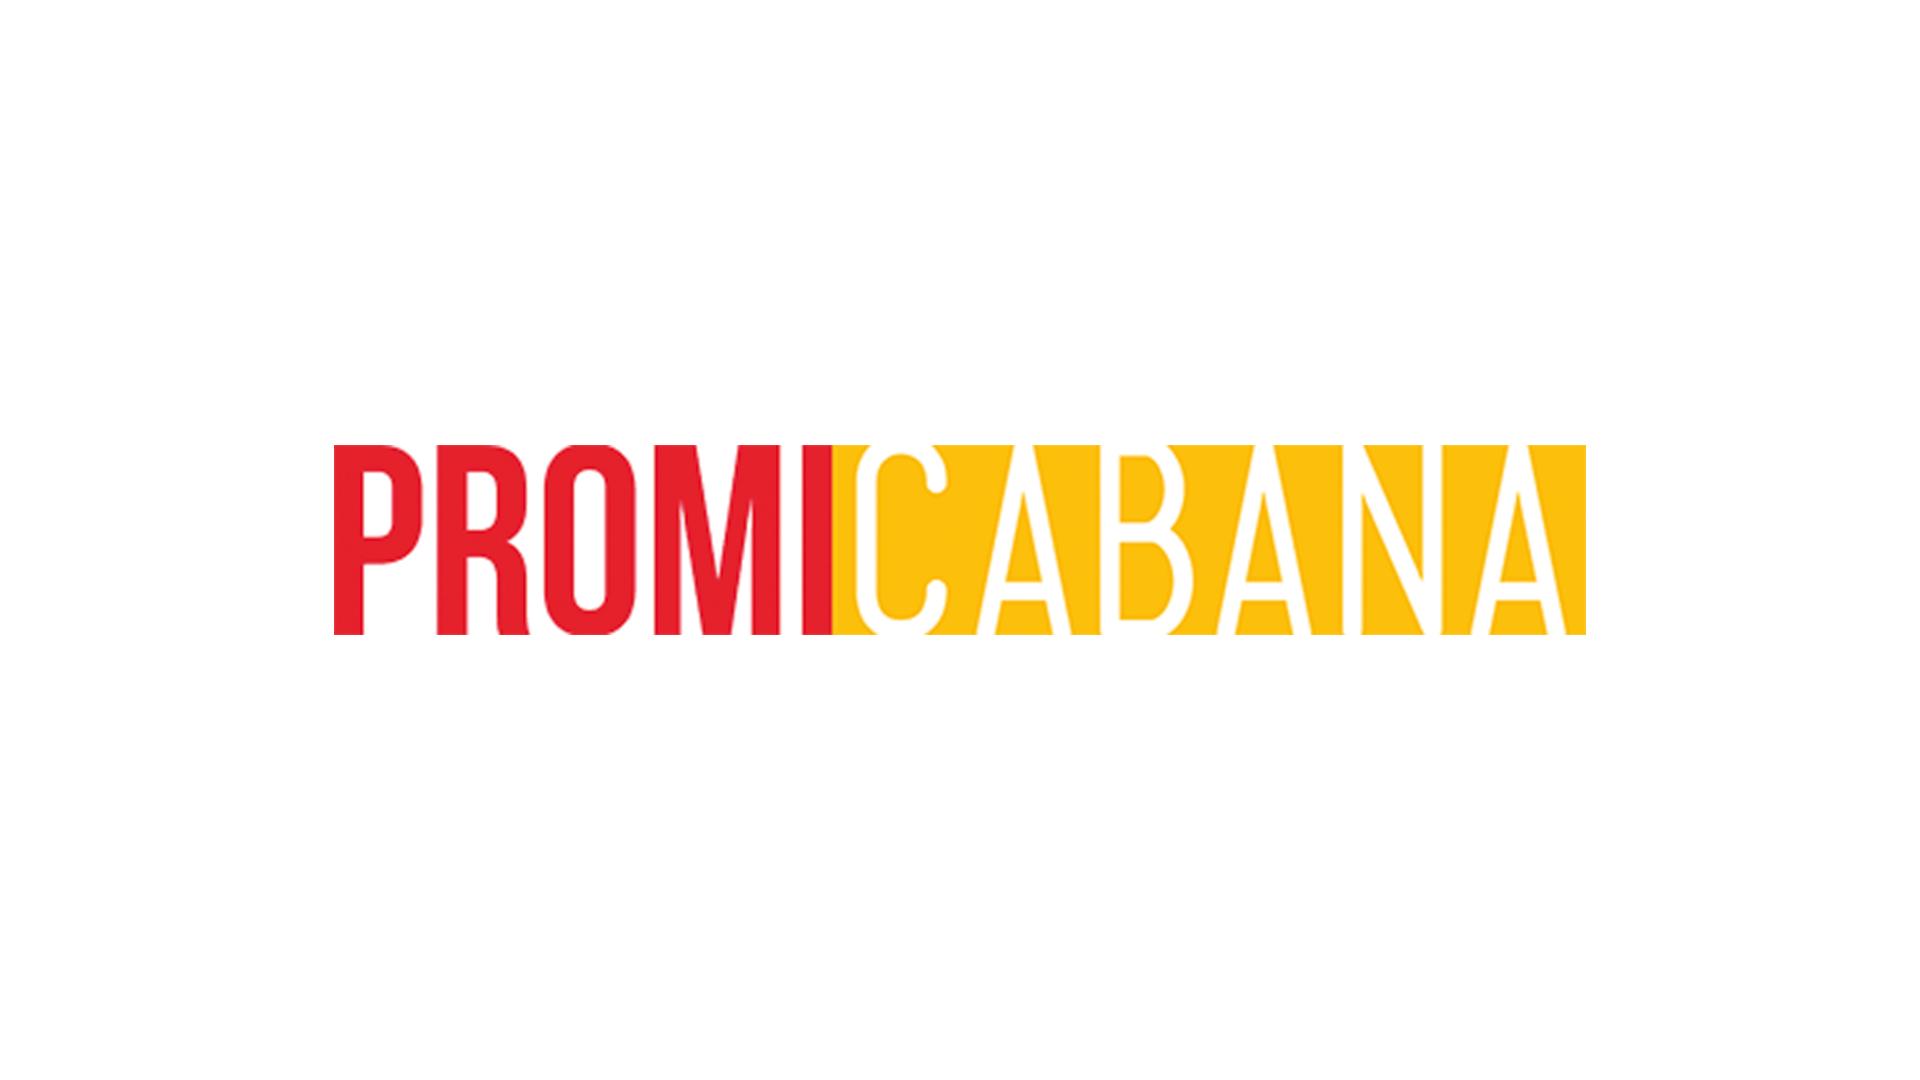 Jorge-Gonzales-Hola-Fiesta-Musikvideo